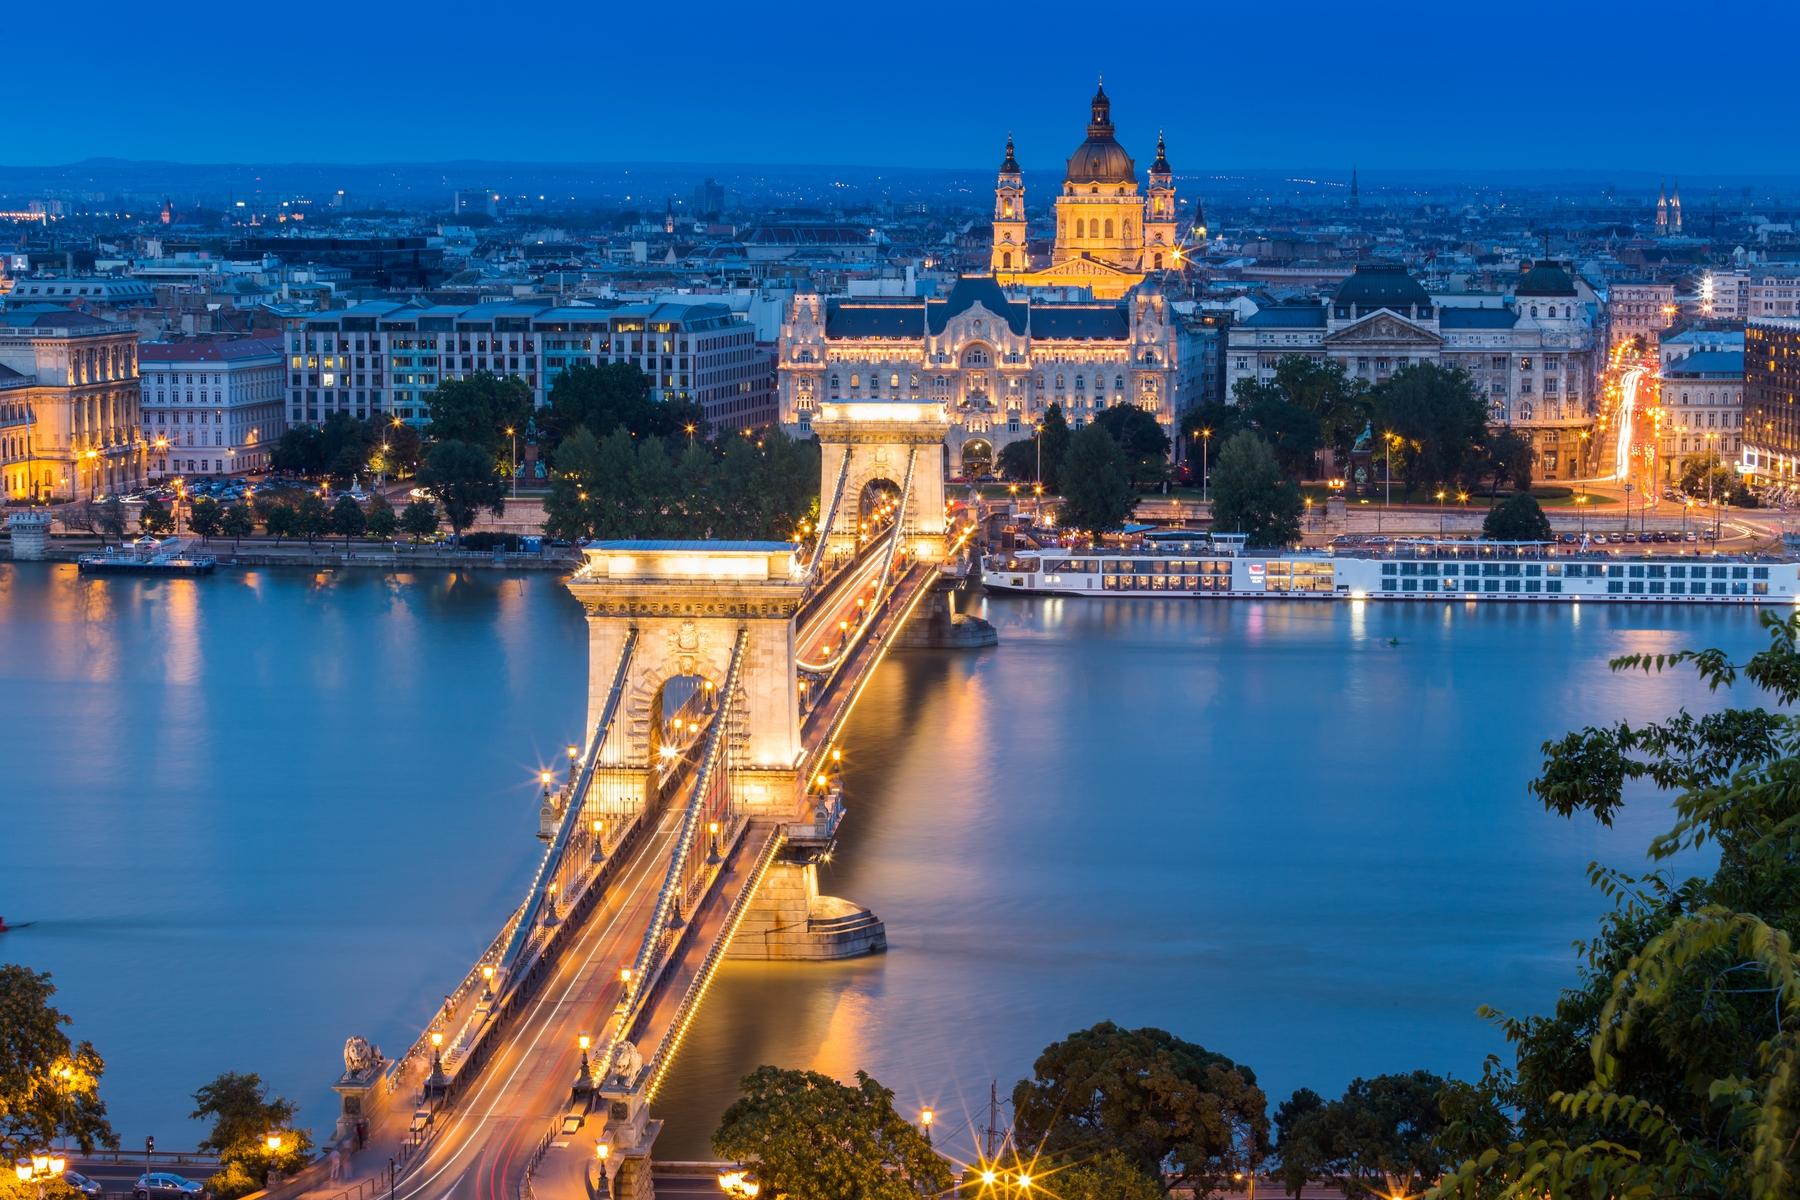 Chain Bridge in Budapest - בודפשט